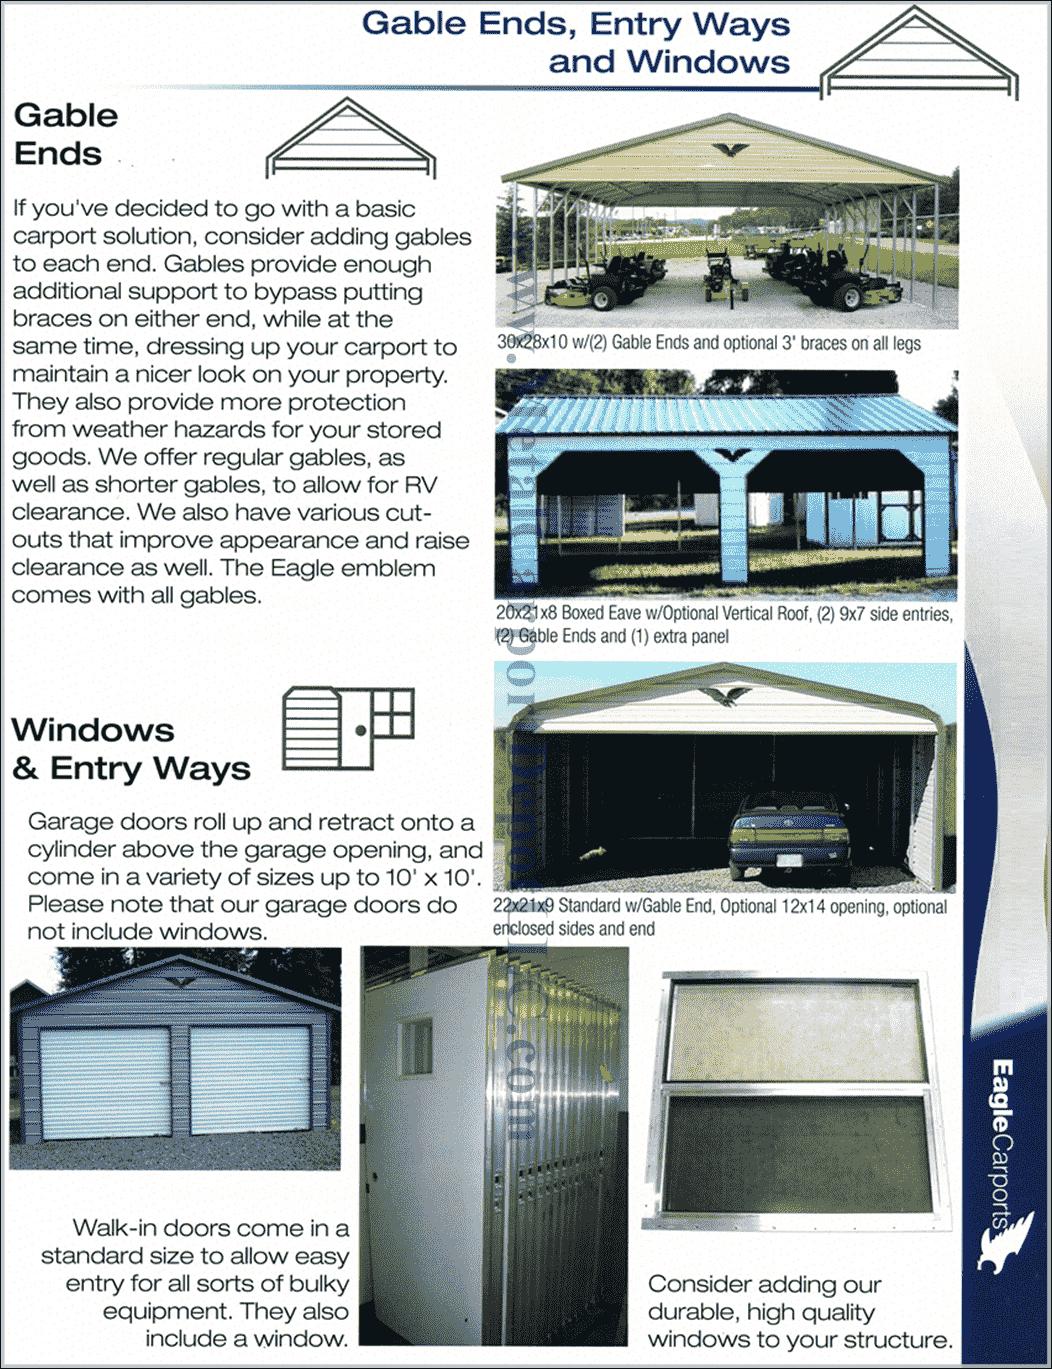 Metal Carport Gable End & Window Information1050 min